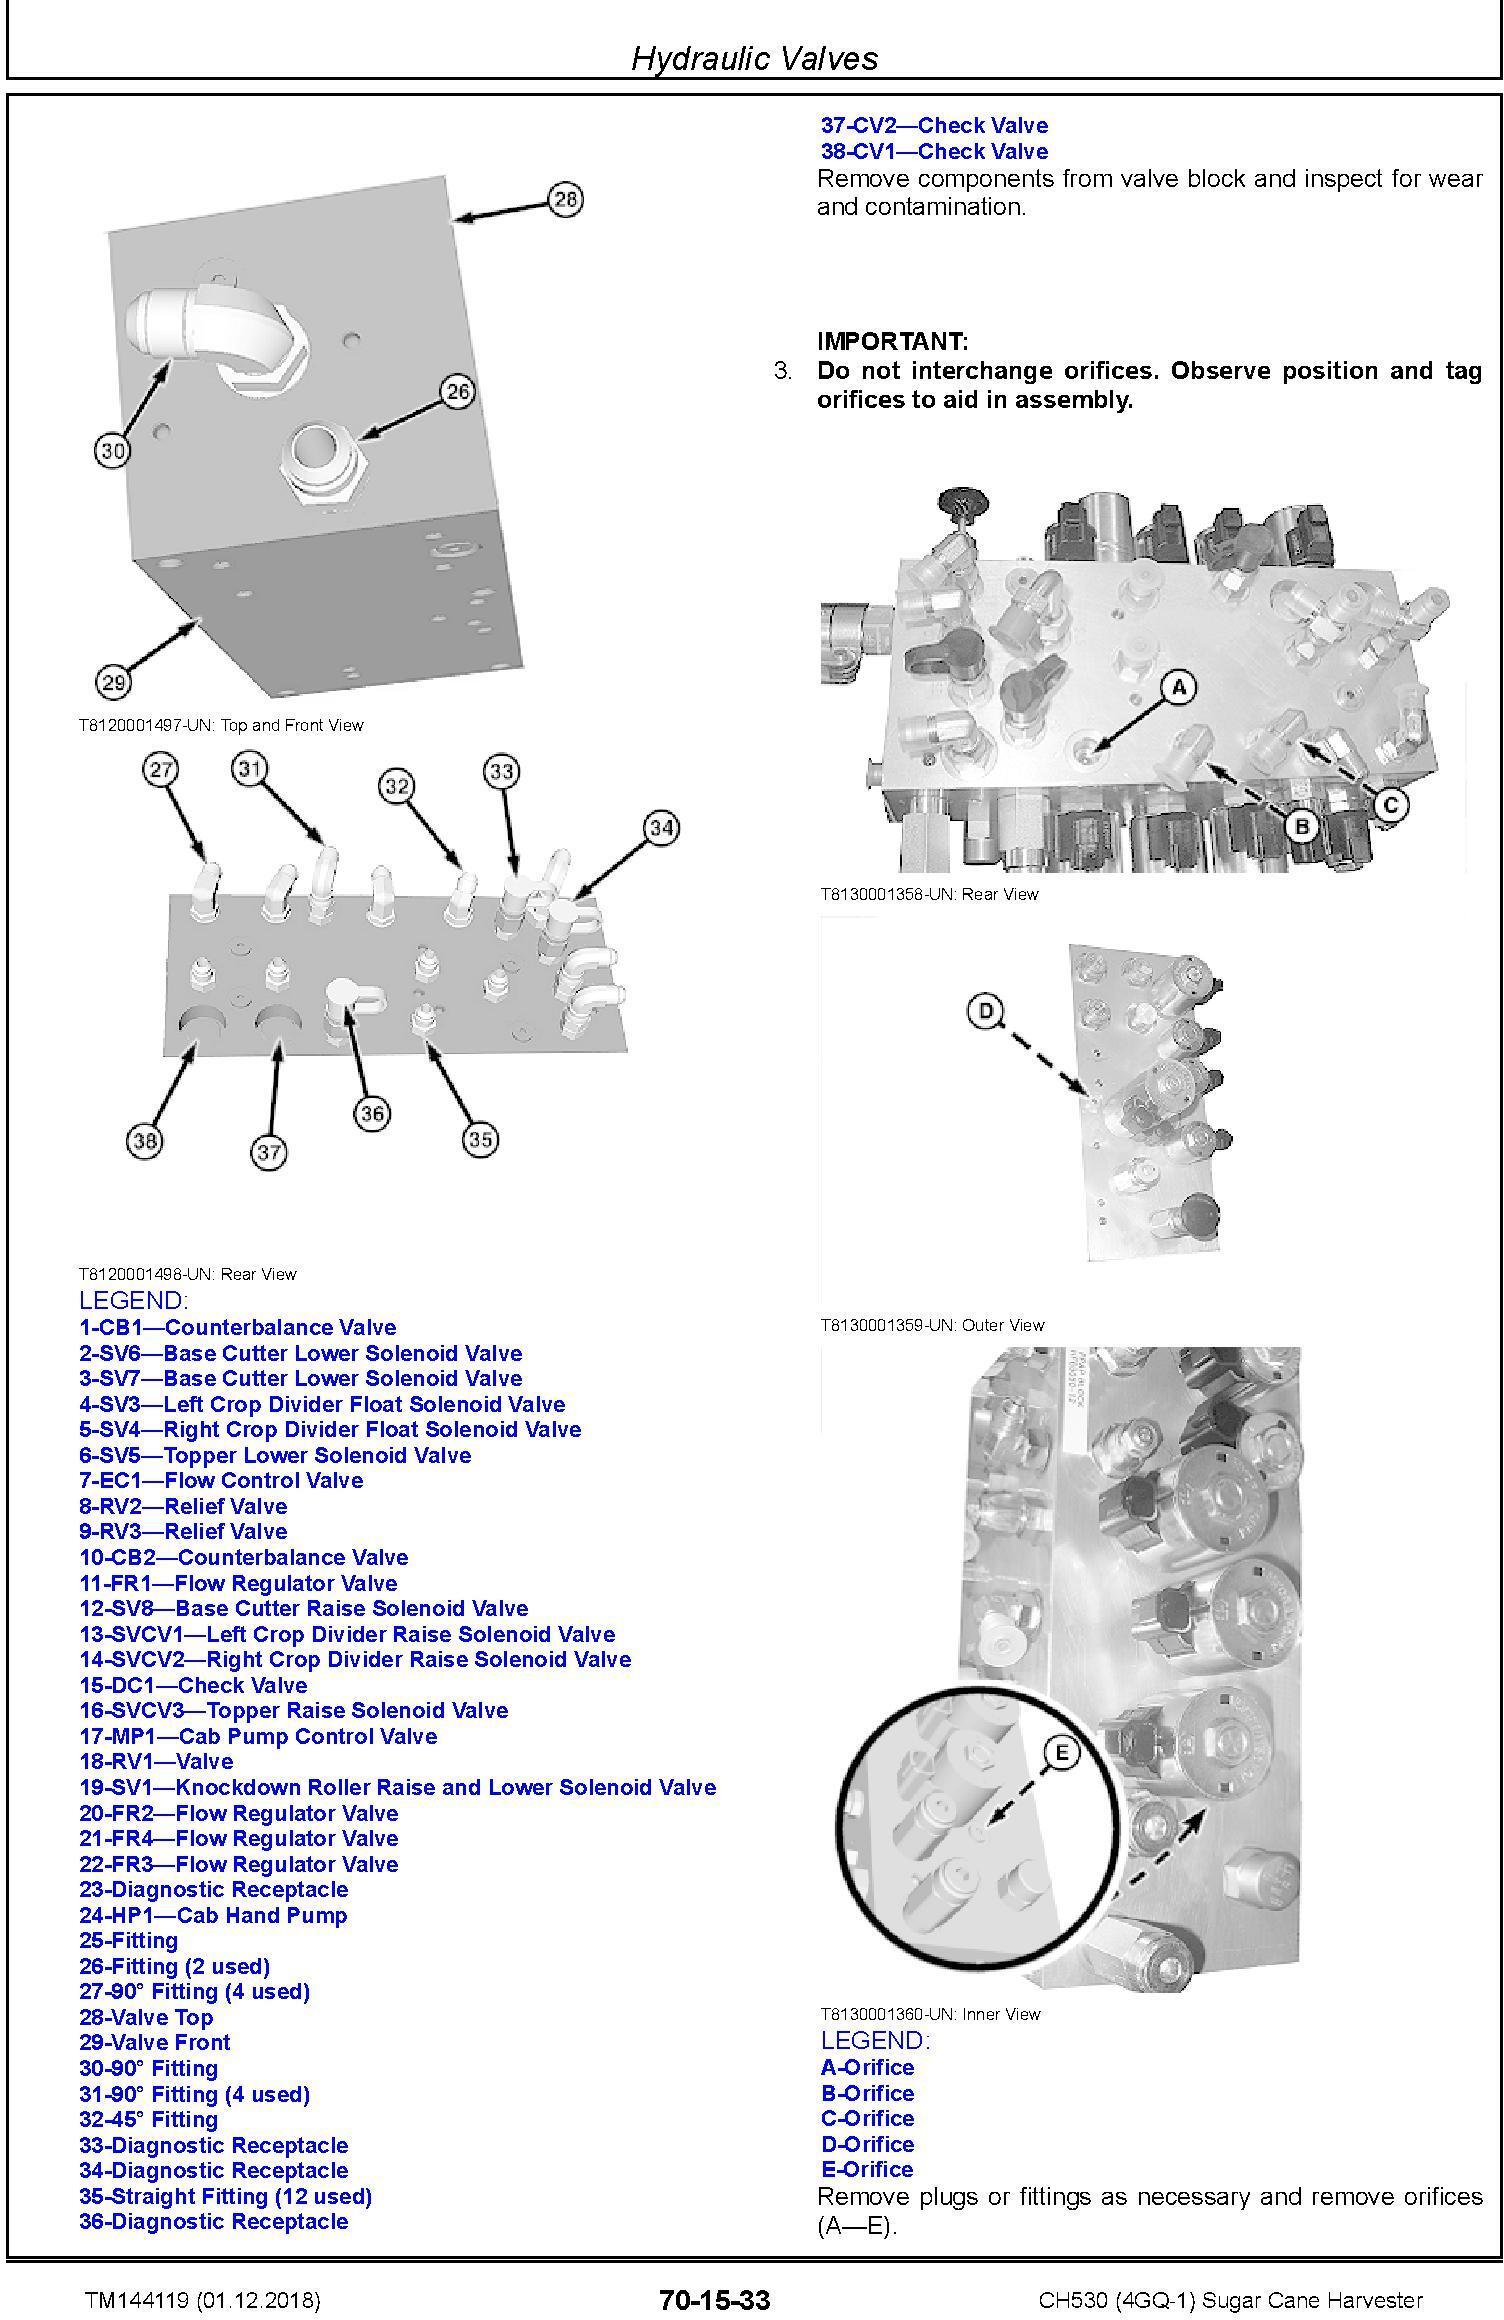 John Deere CH530 (4GQ-1) Sugar Cane Harvester Repair Service Technical Manual (TM144119) - 1